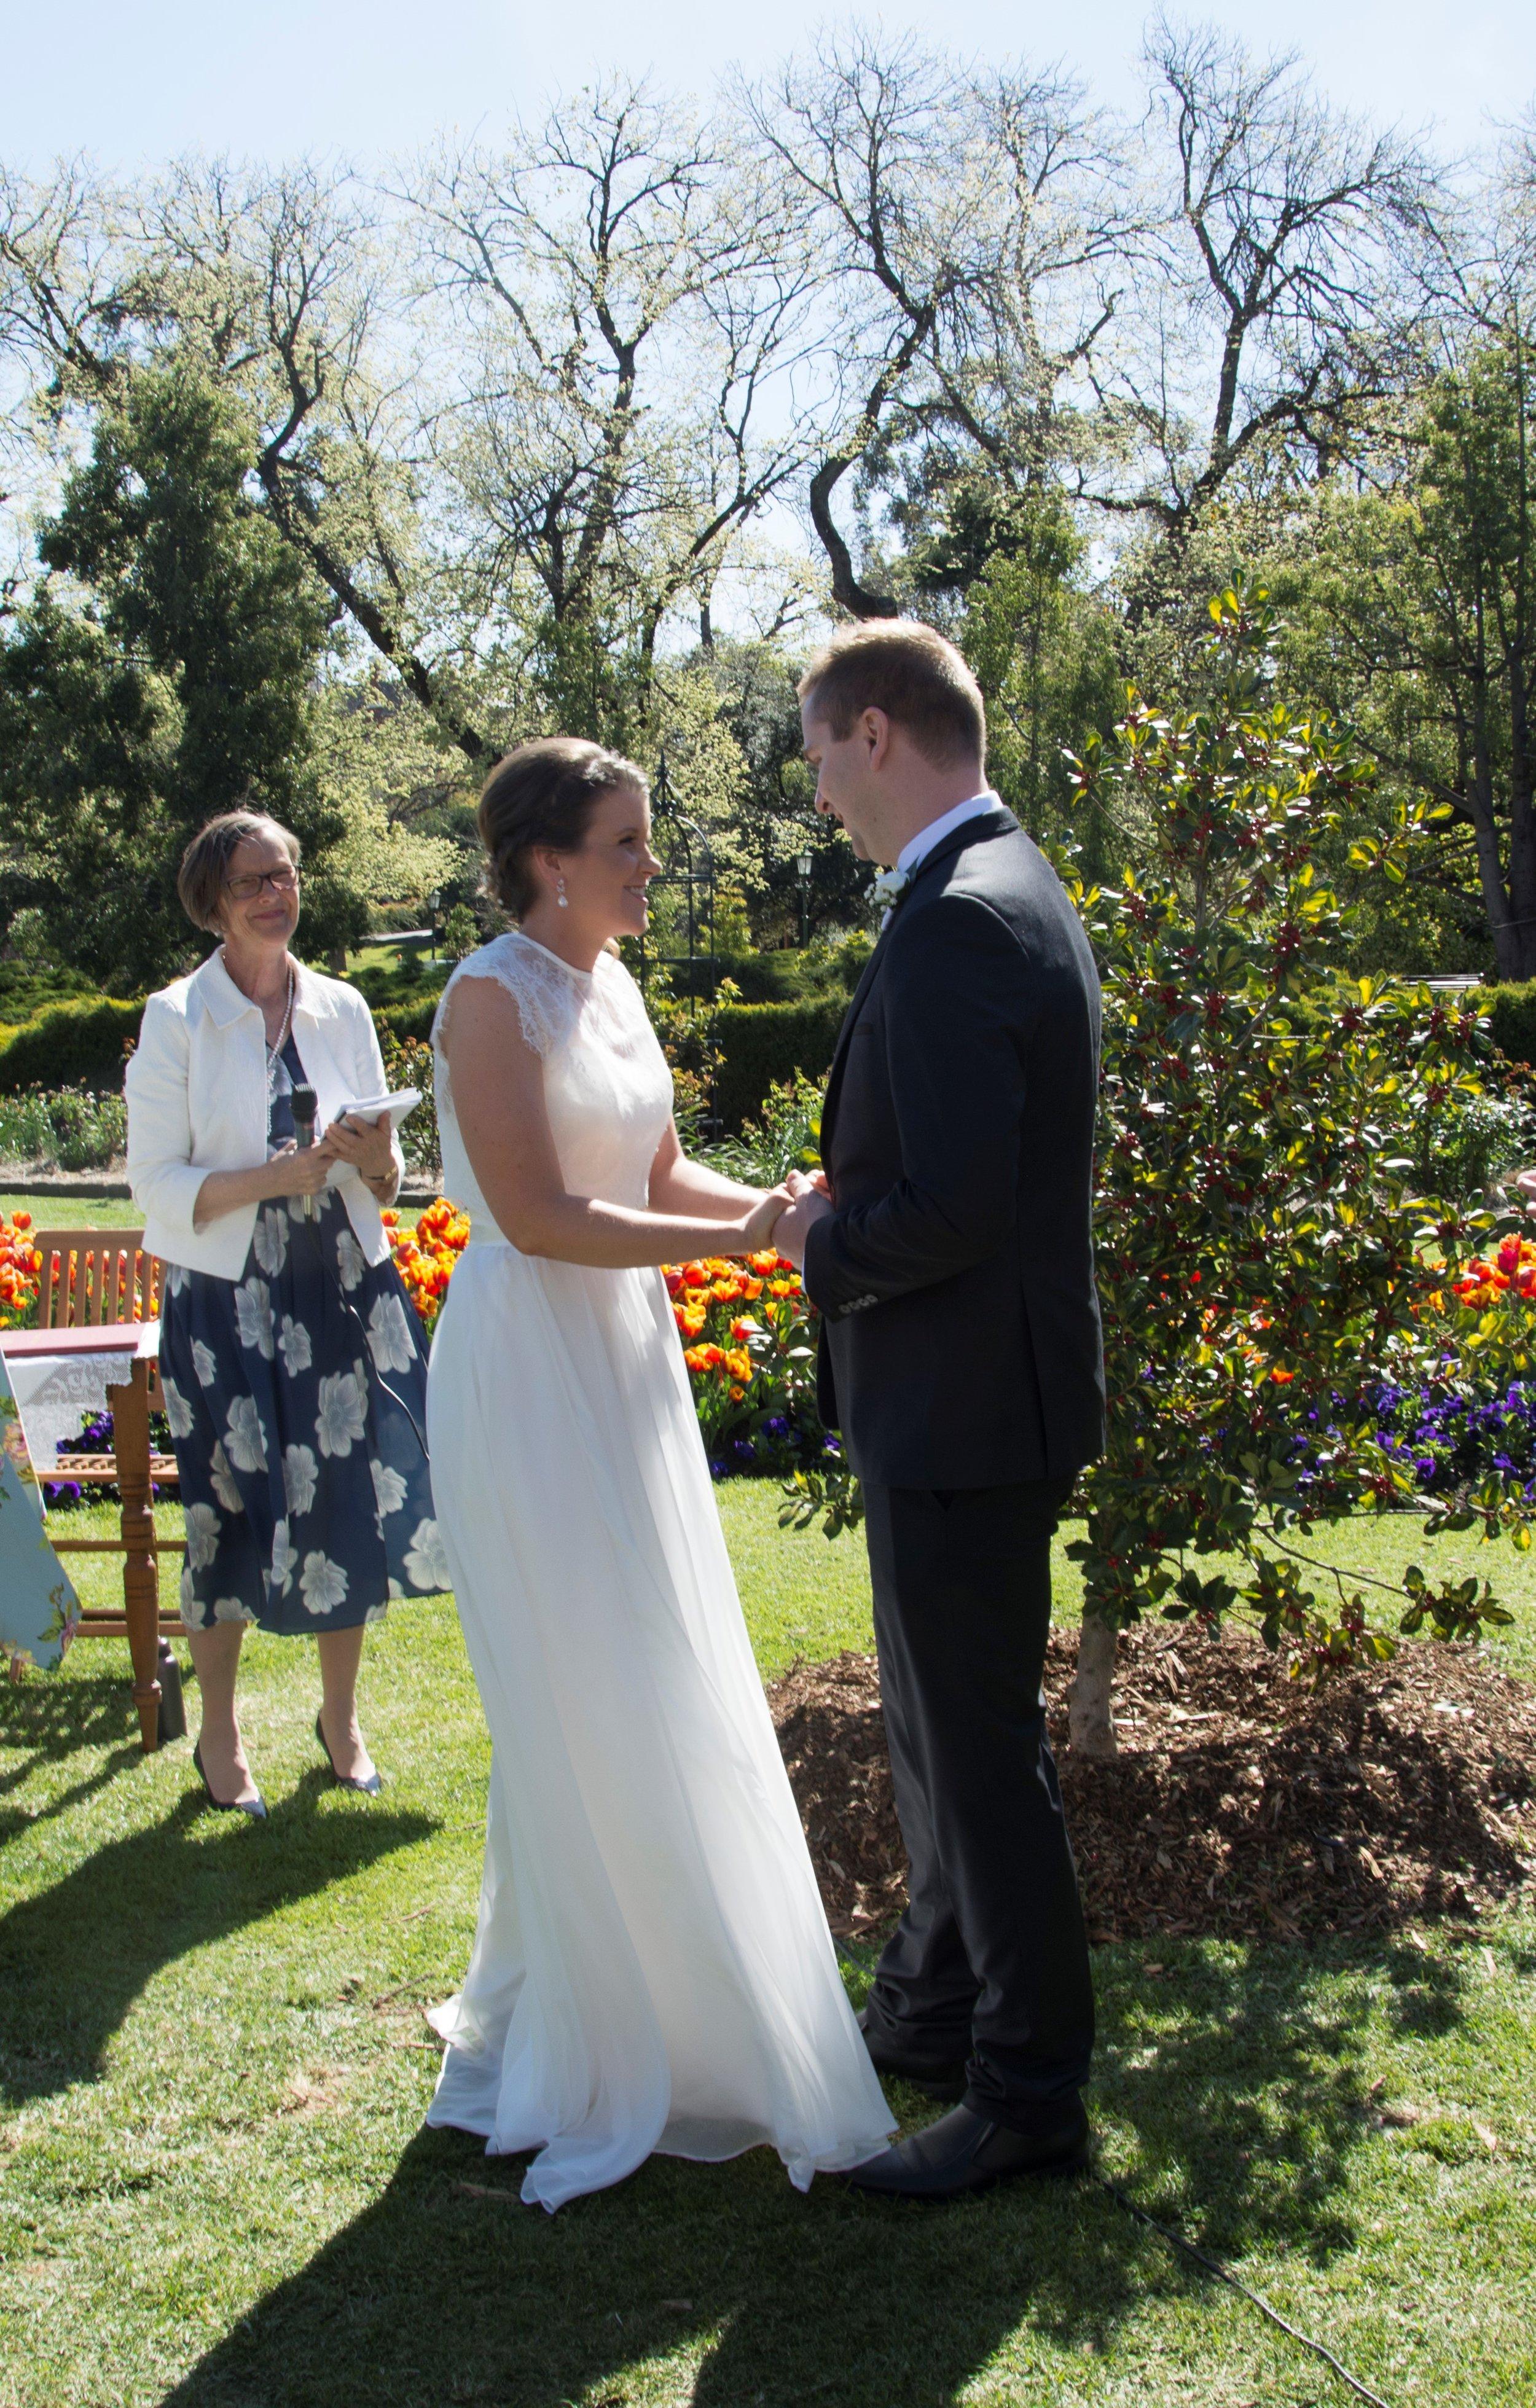 Image: Noni Hyett, Conservatory Gardens wedding, Bendigo